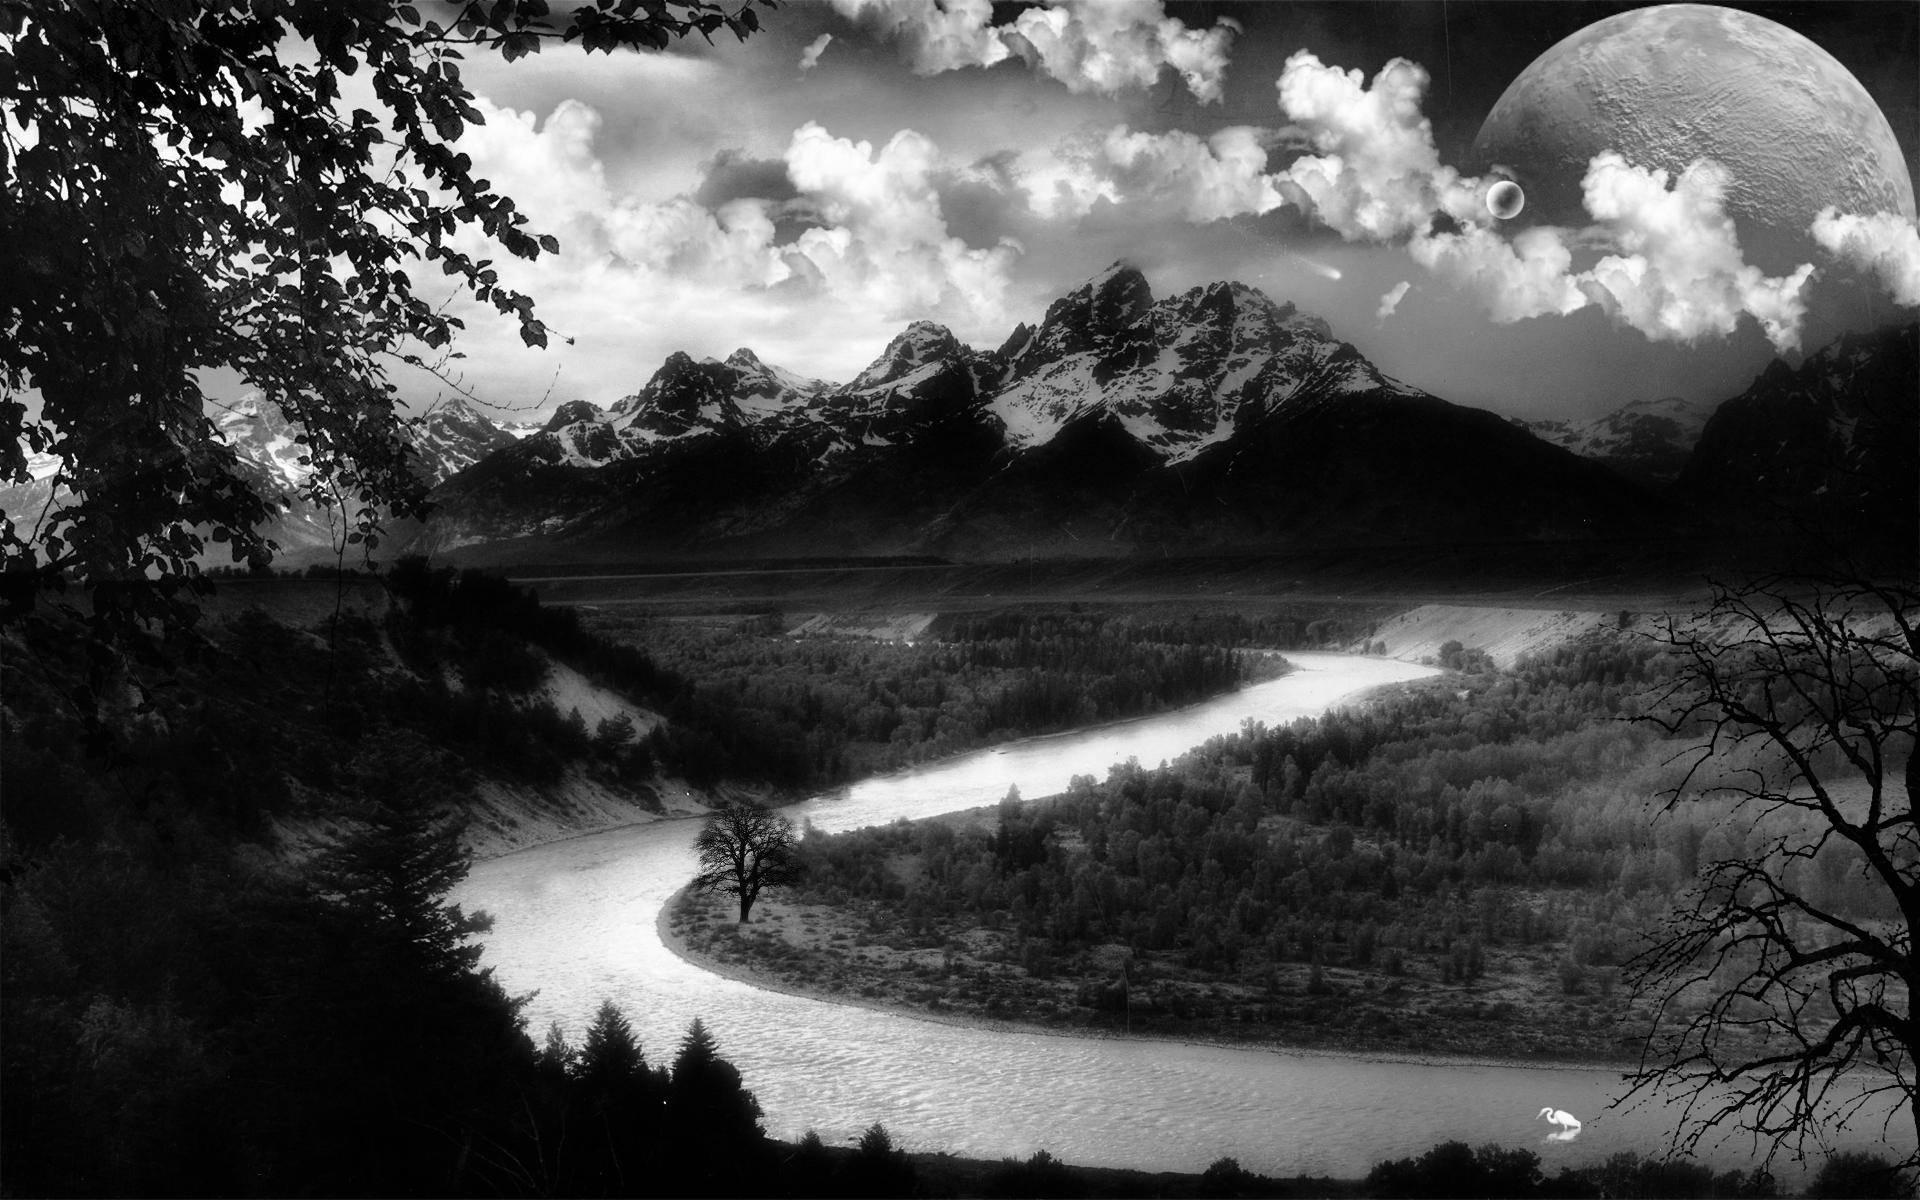 Nature Hd Wallpaper Black And White #8858 Wallpaper   Wallpaper hd